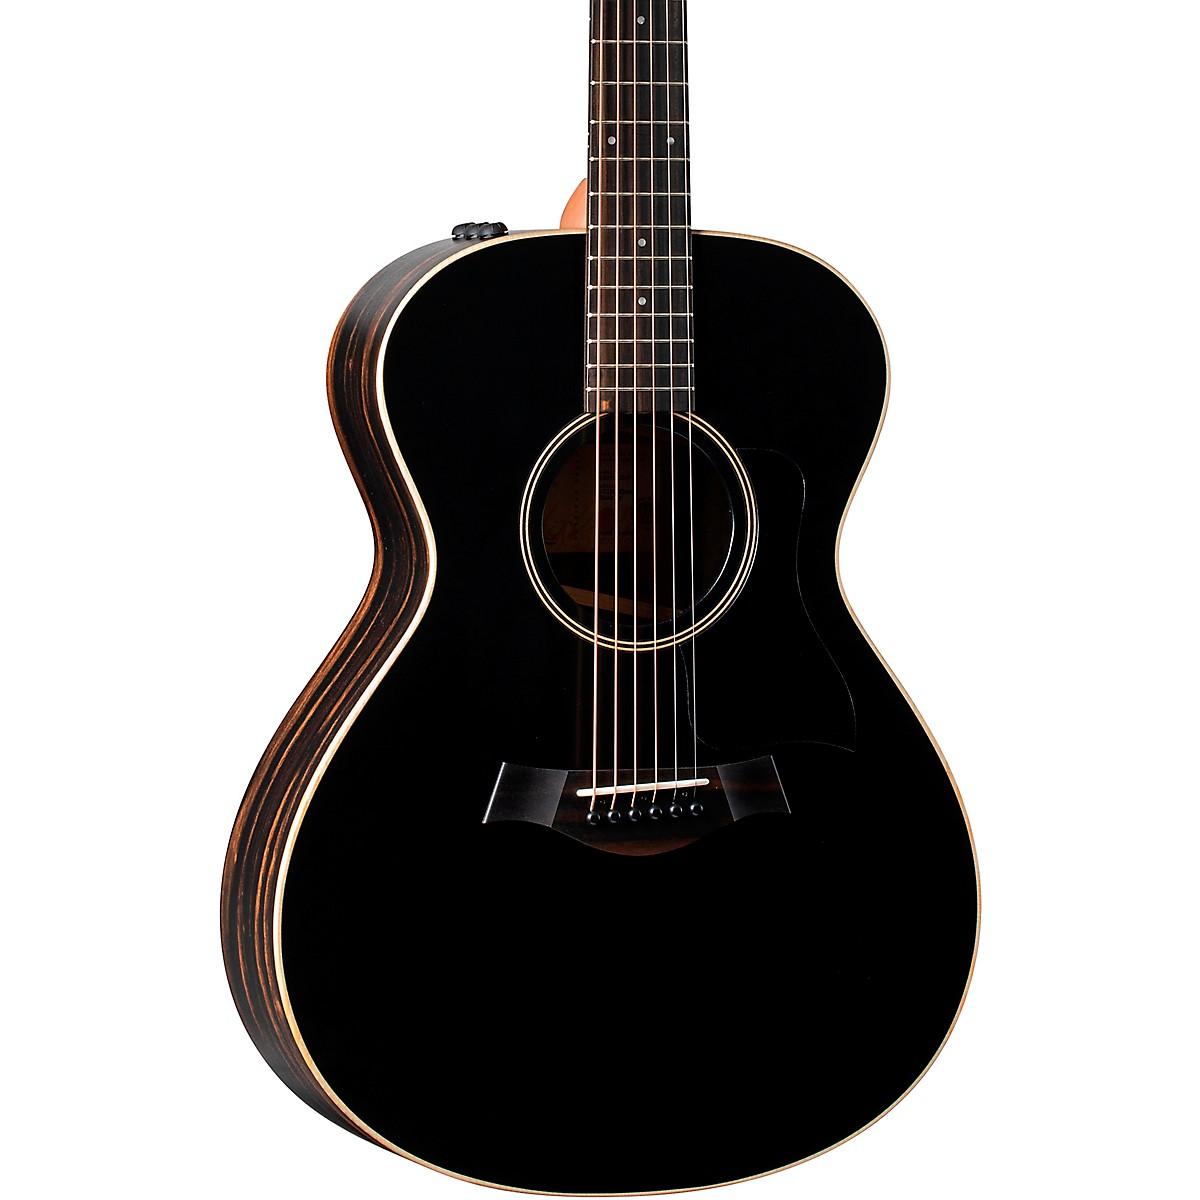 Taylor AD12e American Dream Grand Concert Acoustic-Electric Guitar